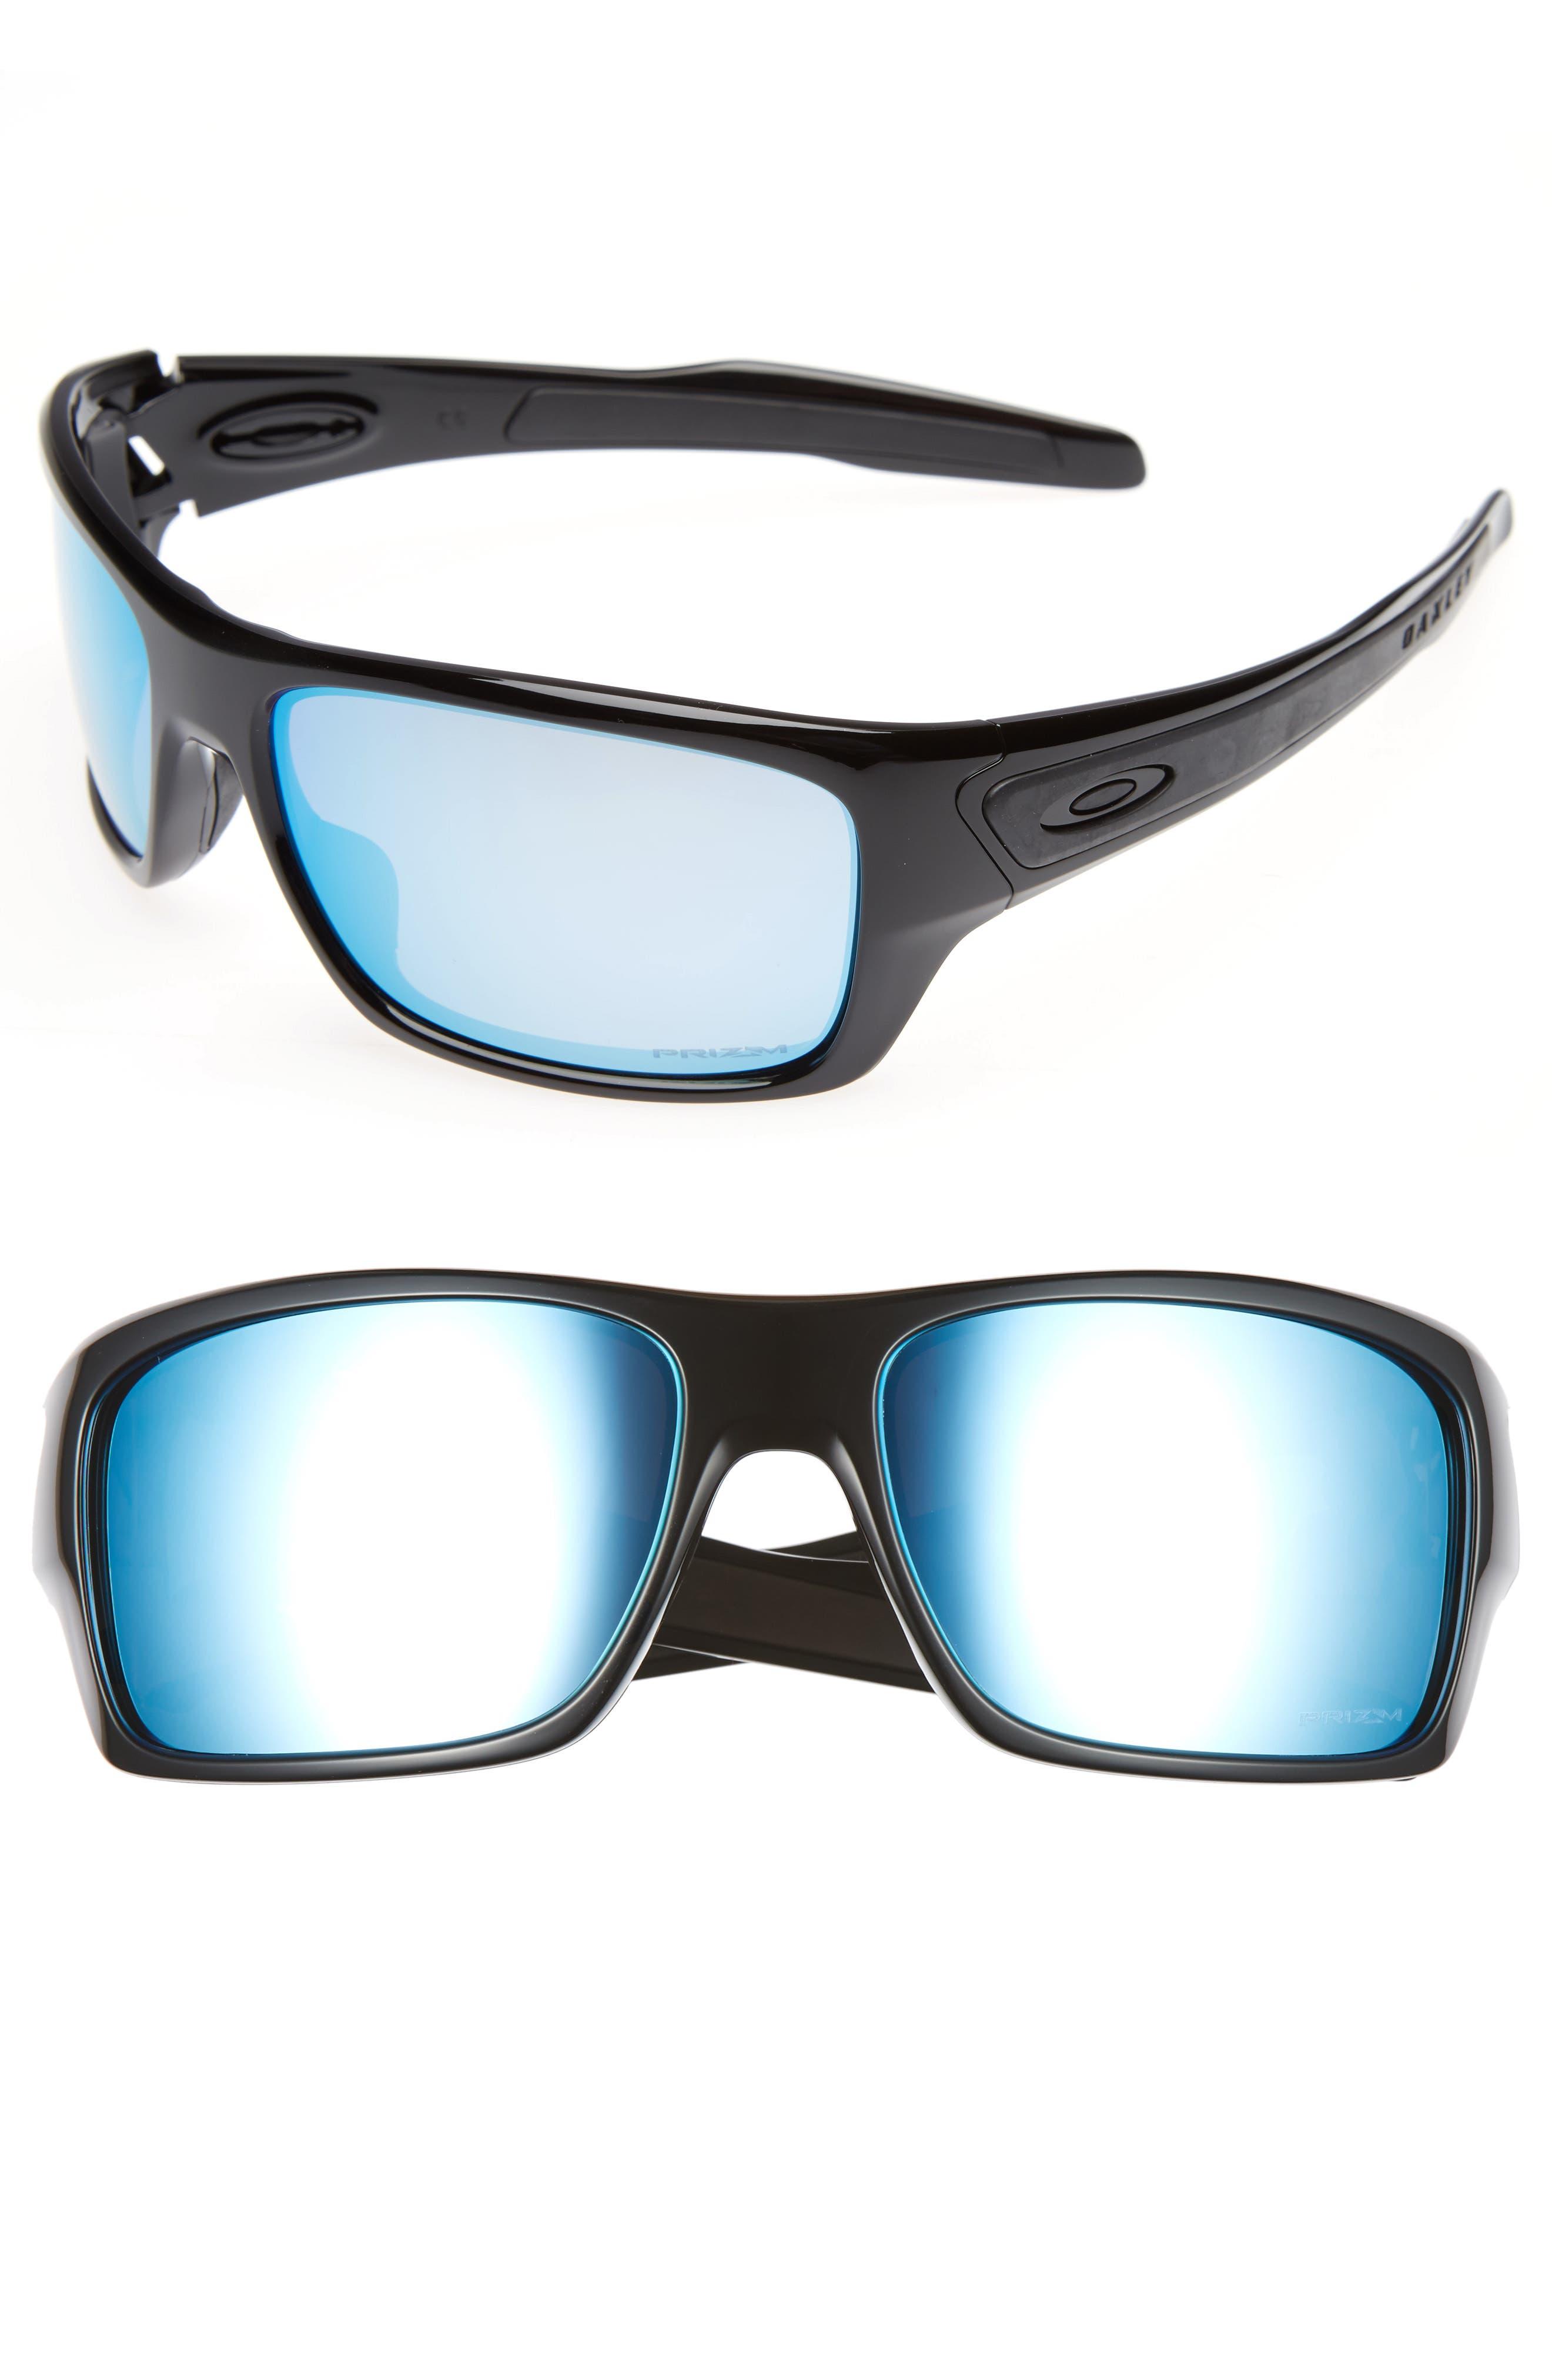 Turbine H2O 65mm Polarized Sunglasses,                             Main thumbnail 1, color,                             Black/Blue